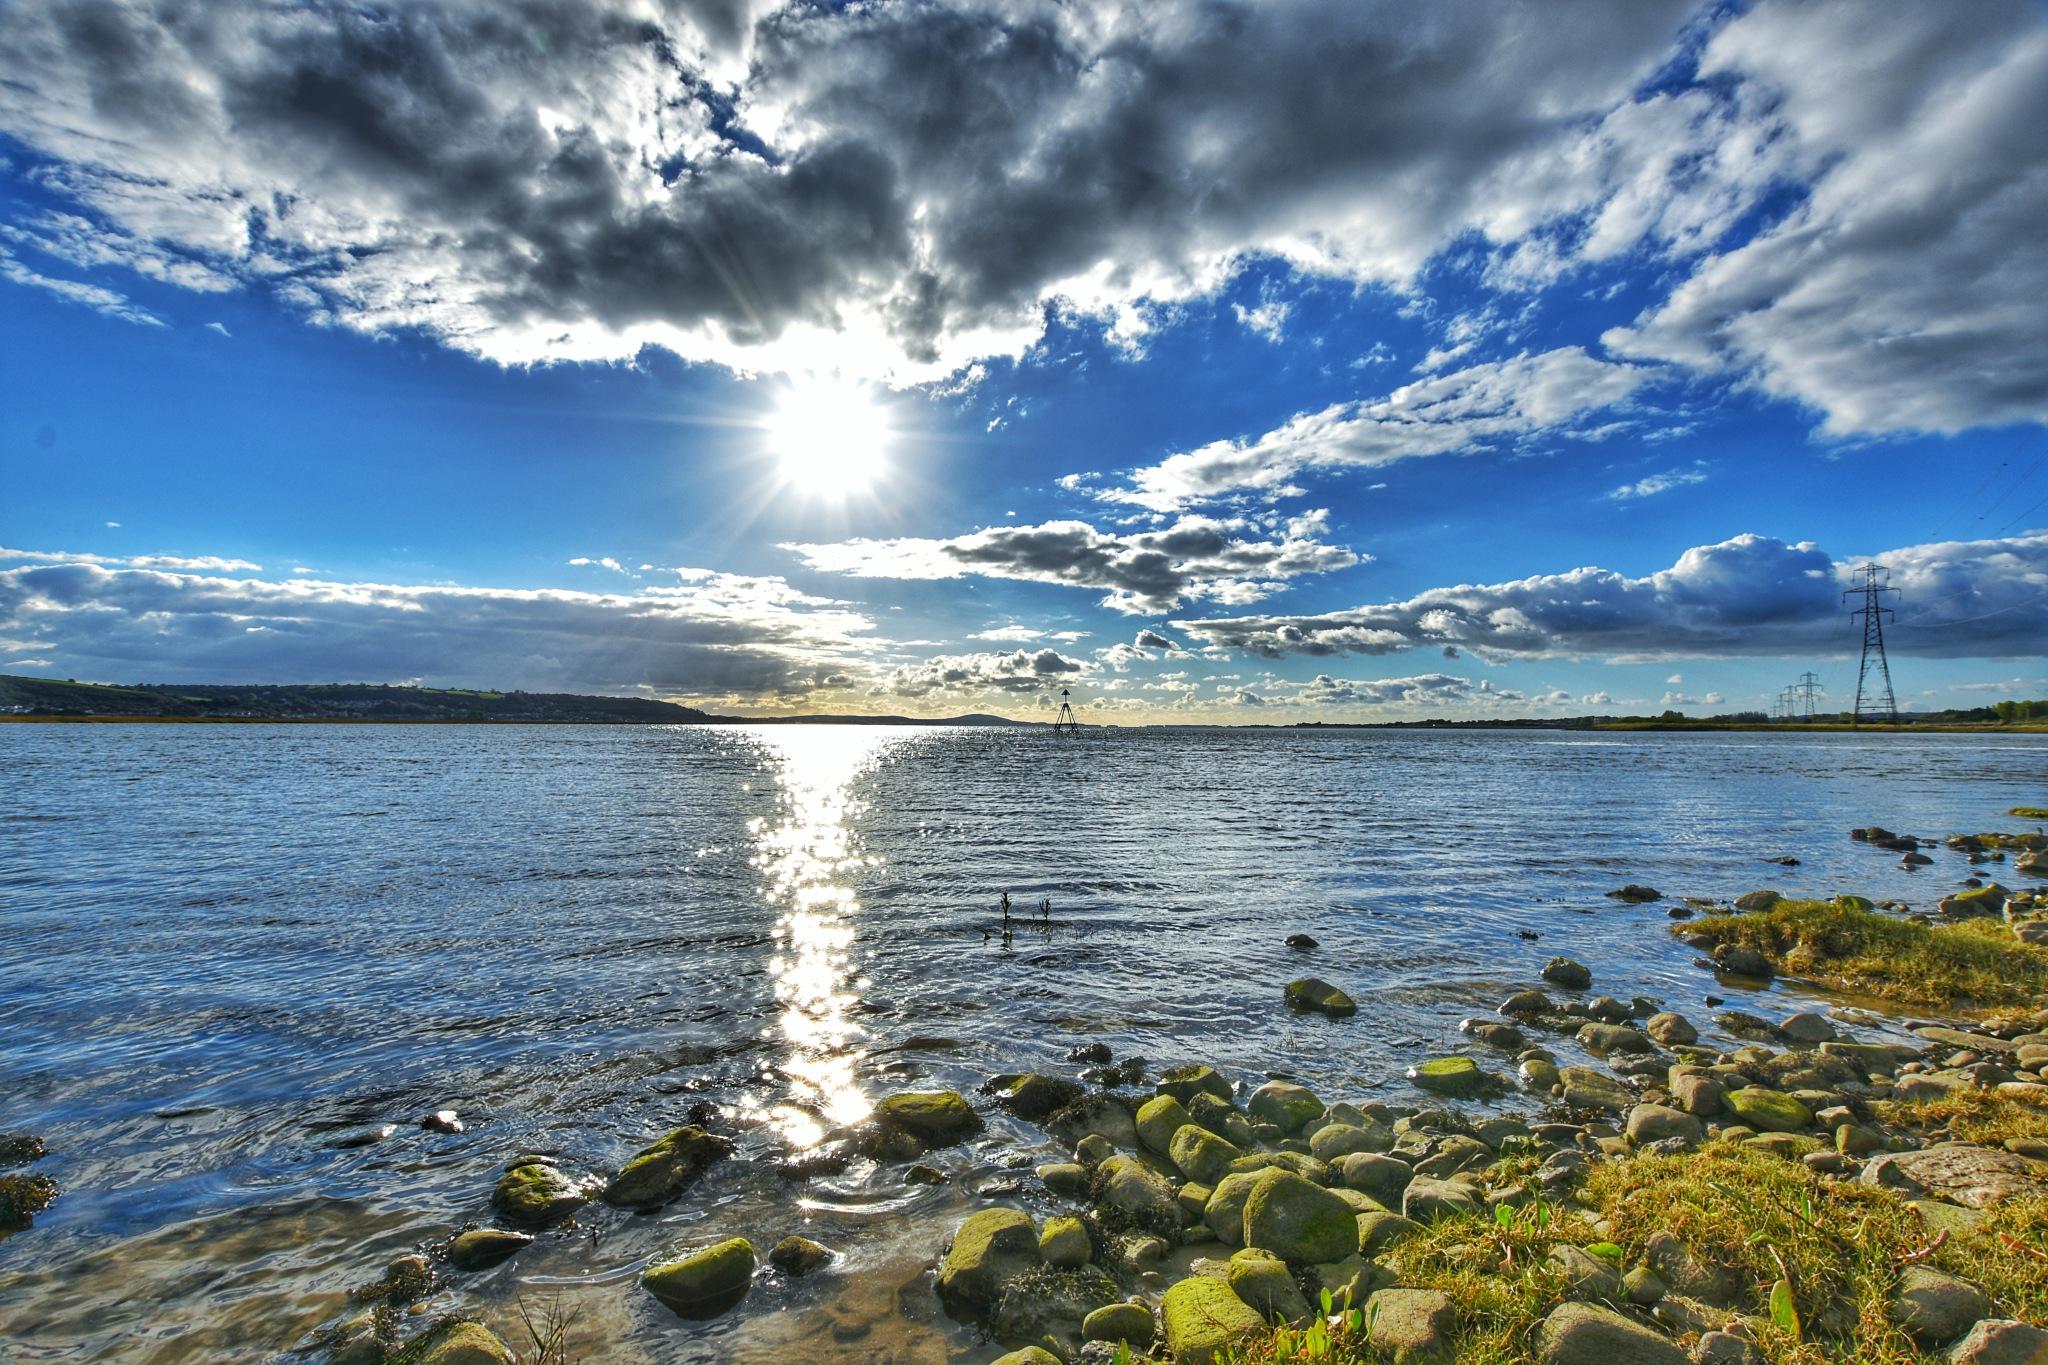 autumn awakens by brian mcauley